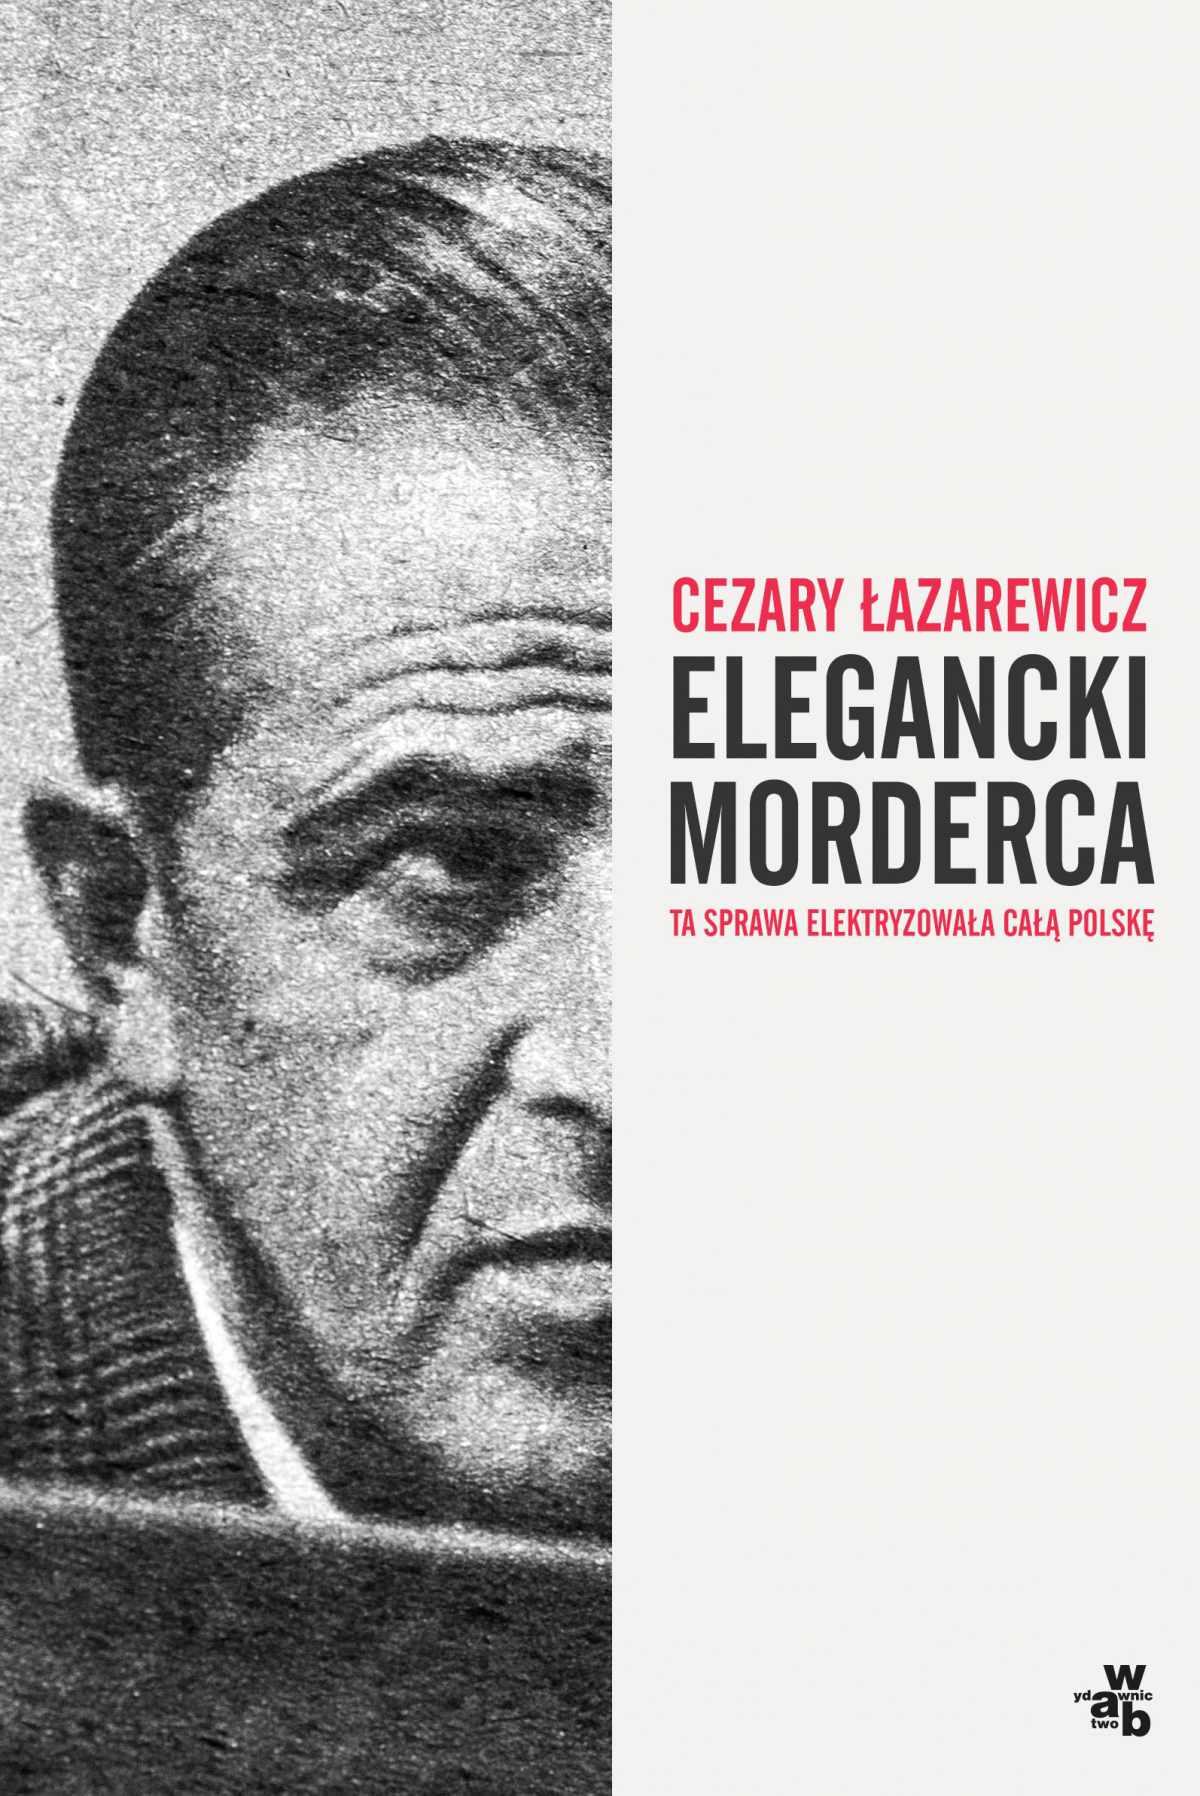 Elegancki morderca - Ebook (Książka EPUB) do pobrania w formacie EPUB